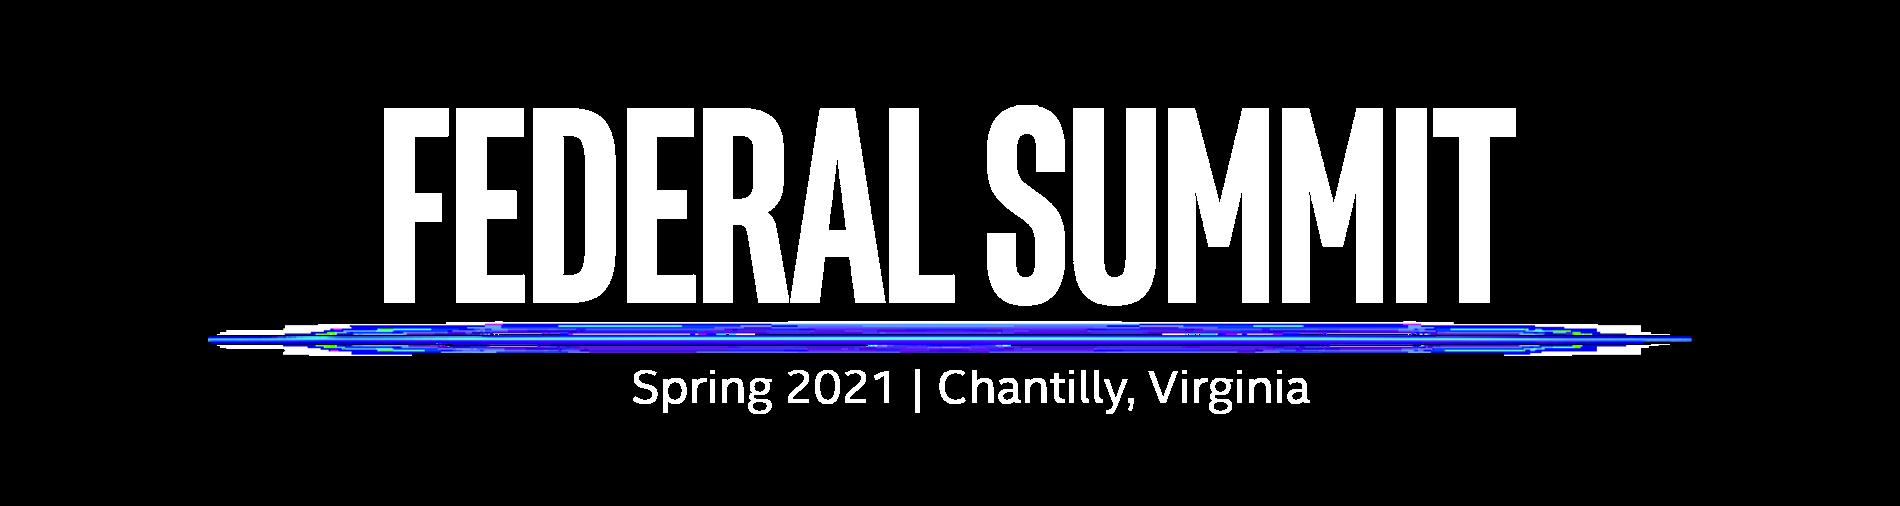 Federal Summit - October 9-10, 2018 | National Harbor, Maryland